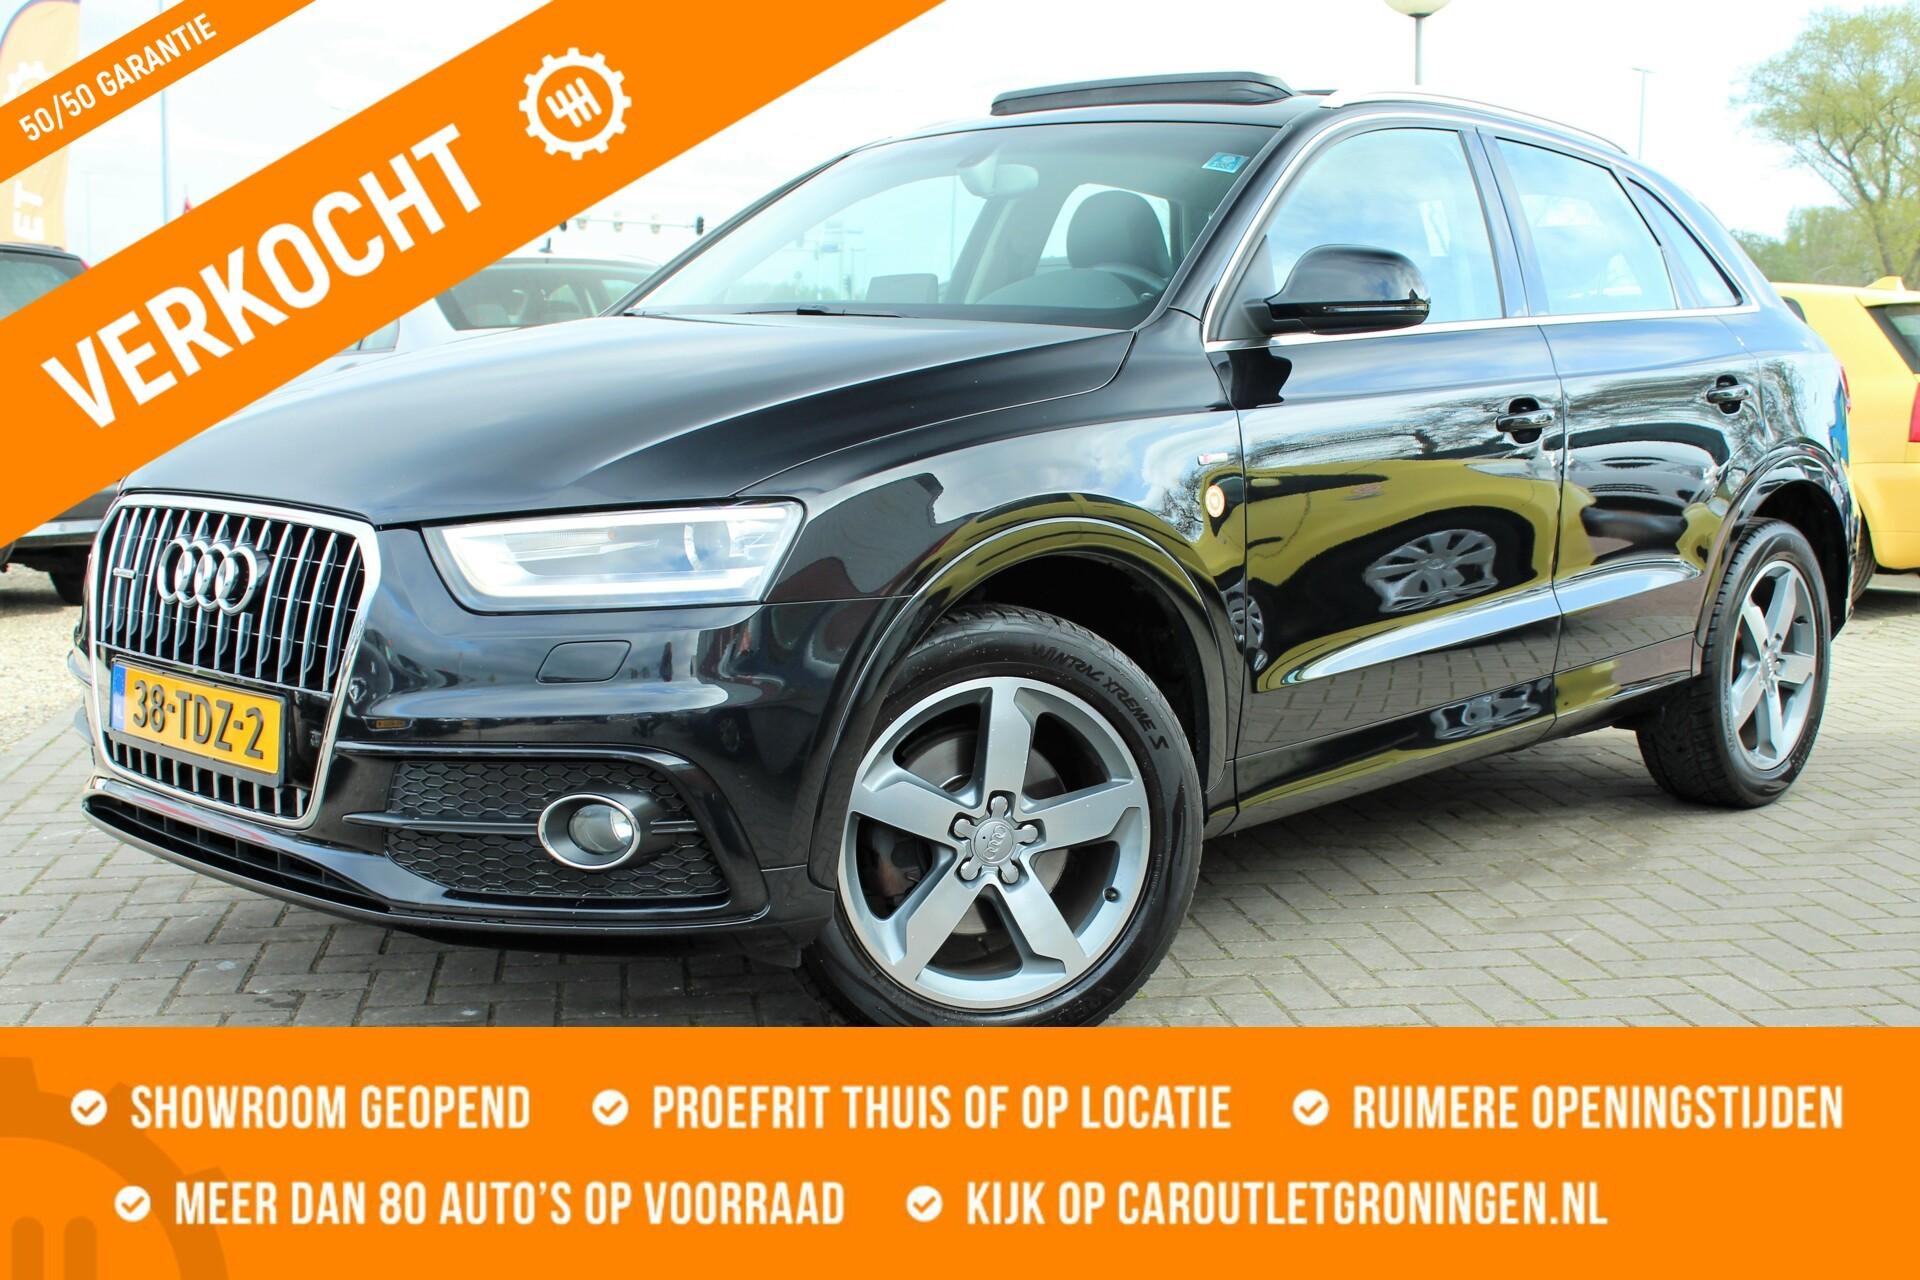 Caroutlet Groningen - Audi Q3 2.0 TDI quattro | 2X S-LINE | PANODAK | LED/XENON |